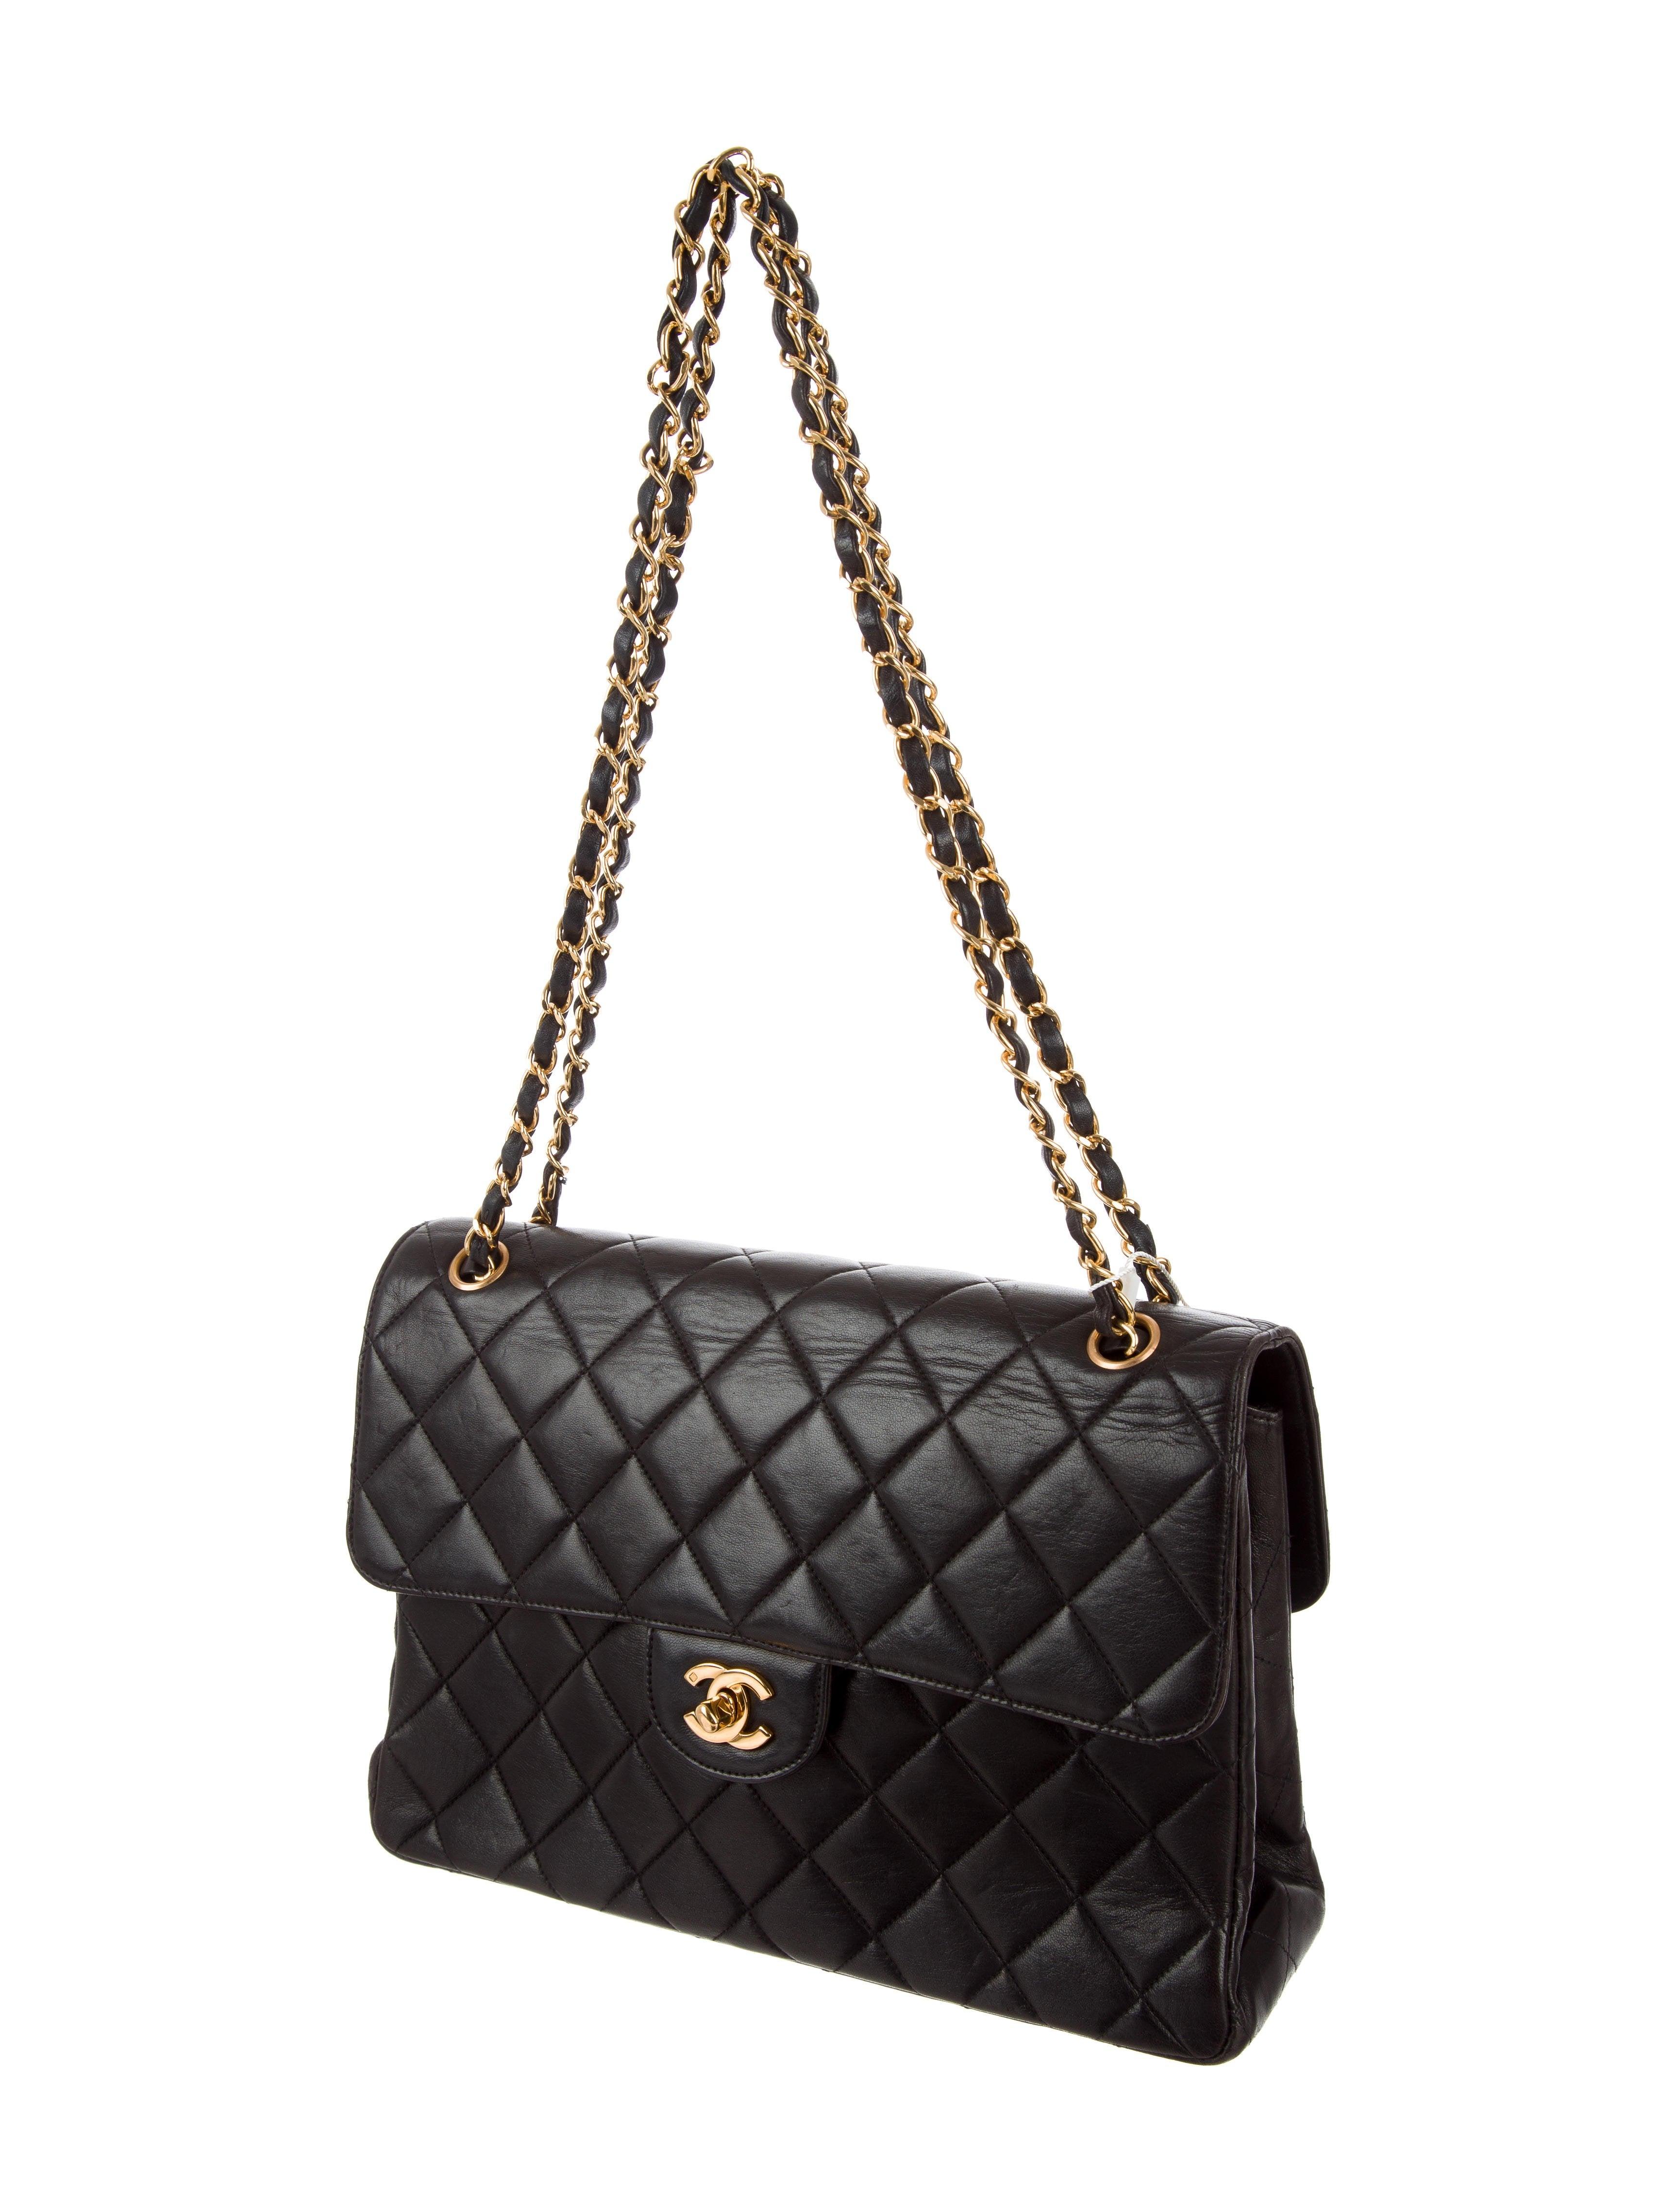 Chanel Jumbo Double Sided Flap Bag - Handbags - CHA213569  4f66cbabacf82